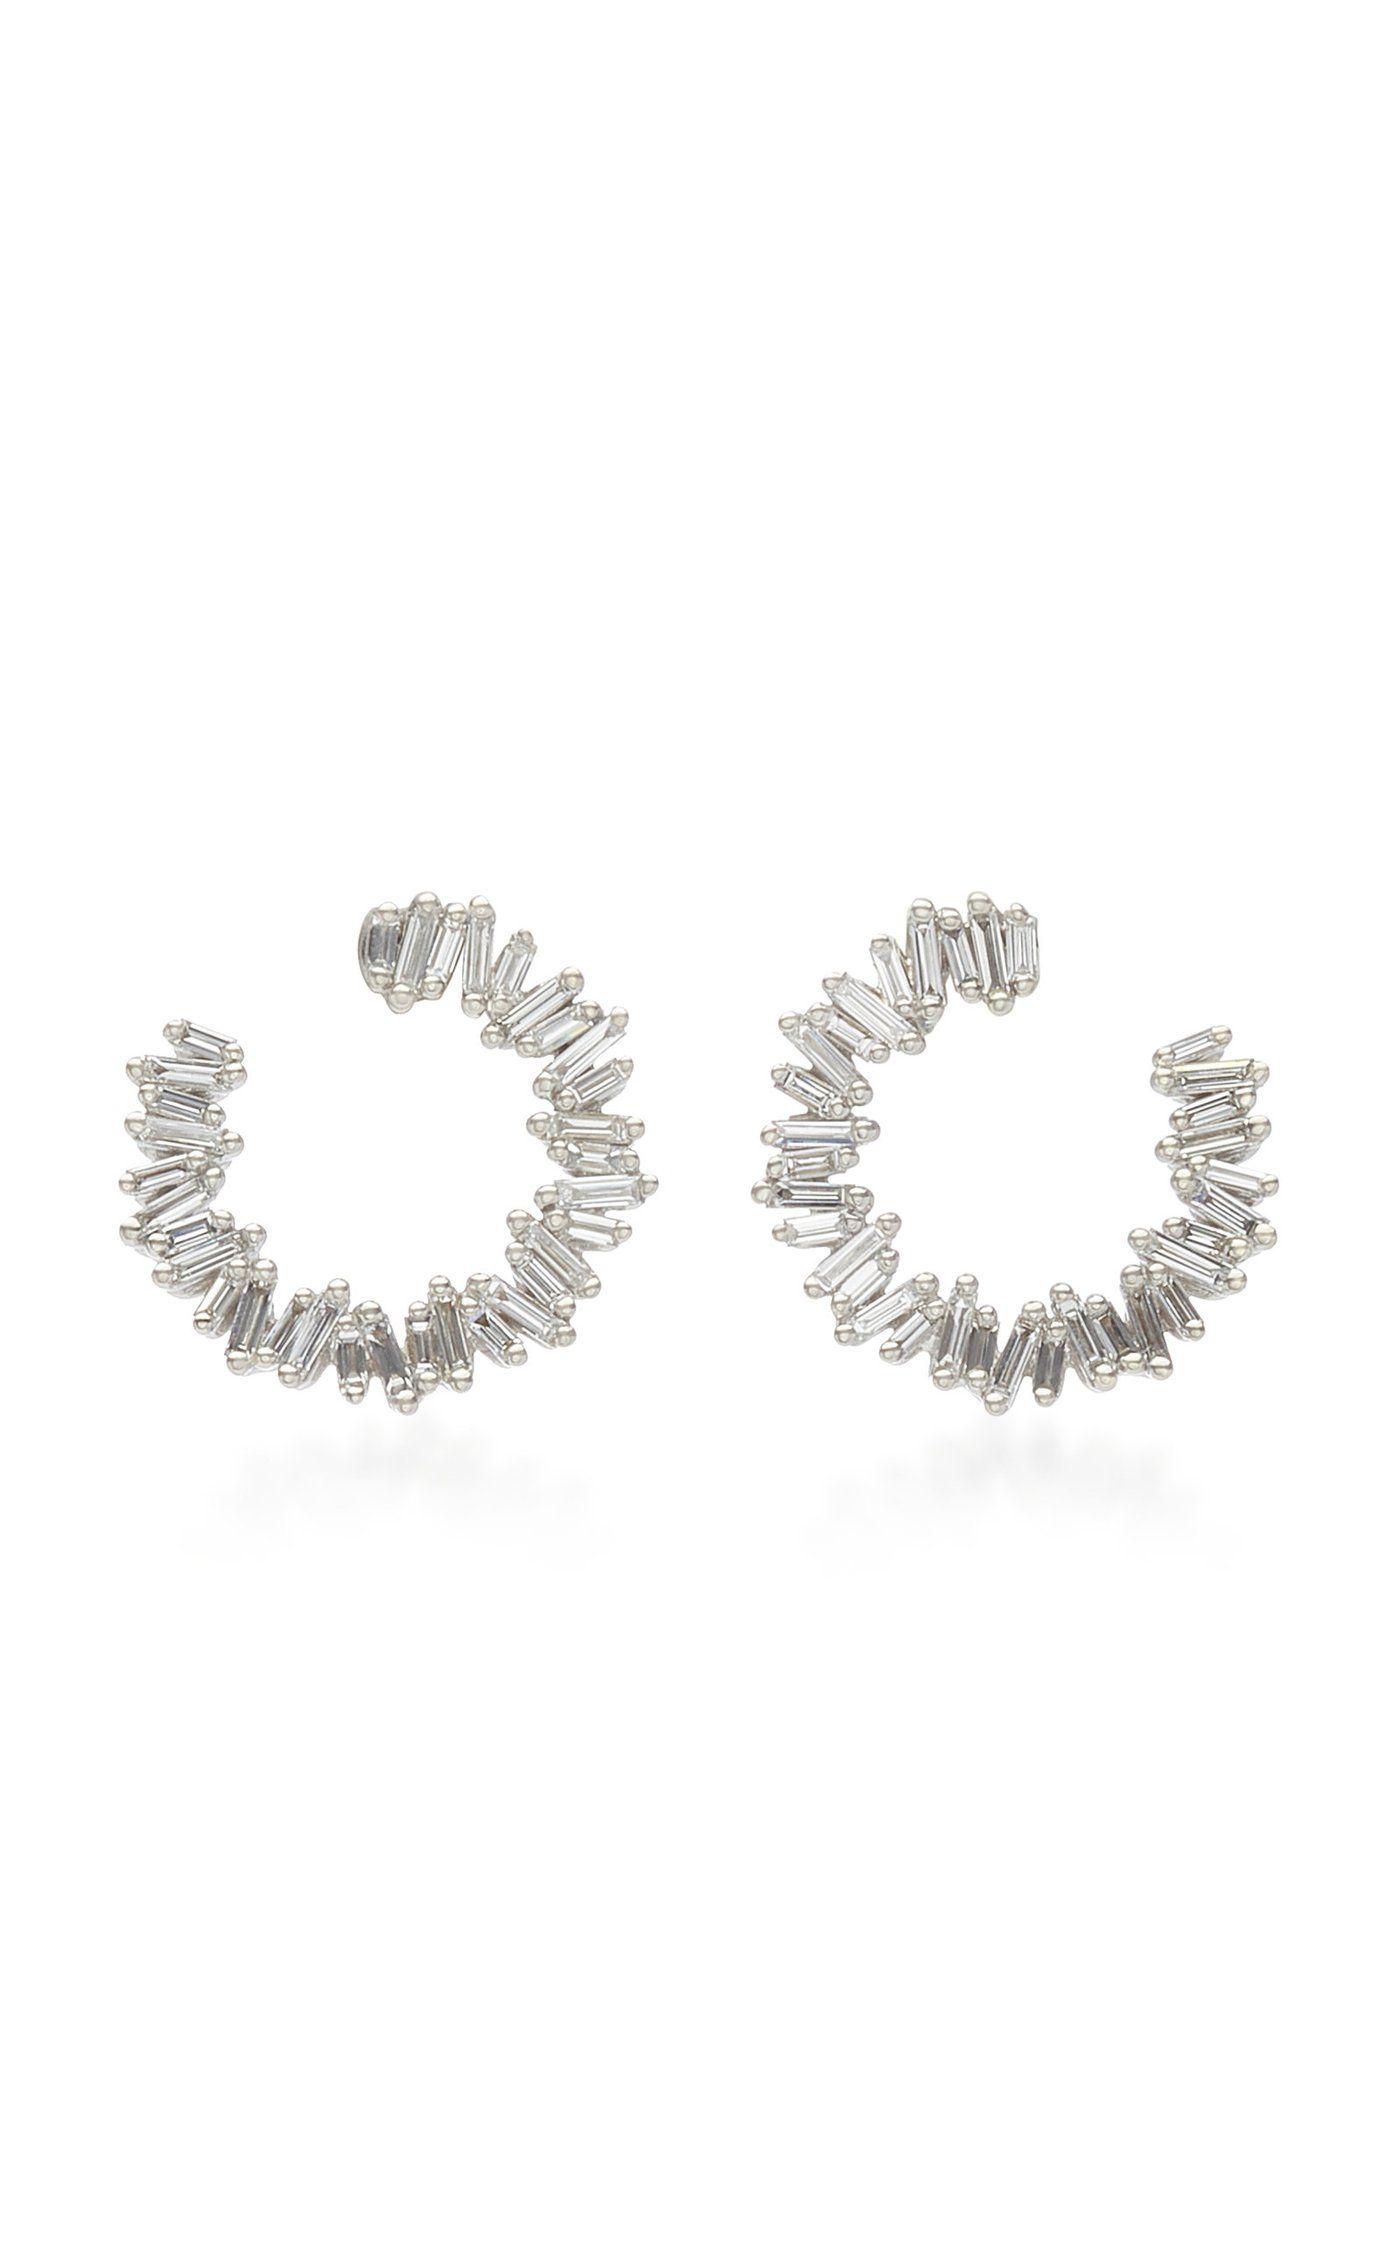 18k White Gold Spiral Hoop Earrings By Suzanne Kalan Moda Operandi Bisuteria Joyas